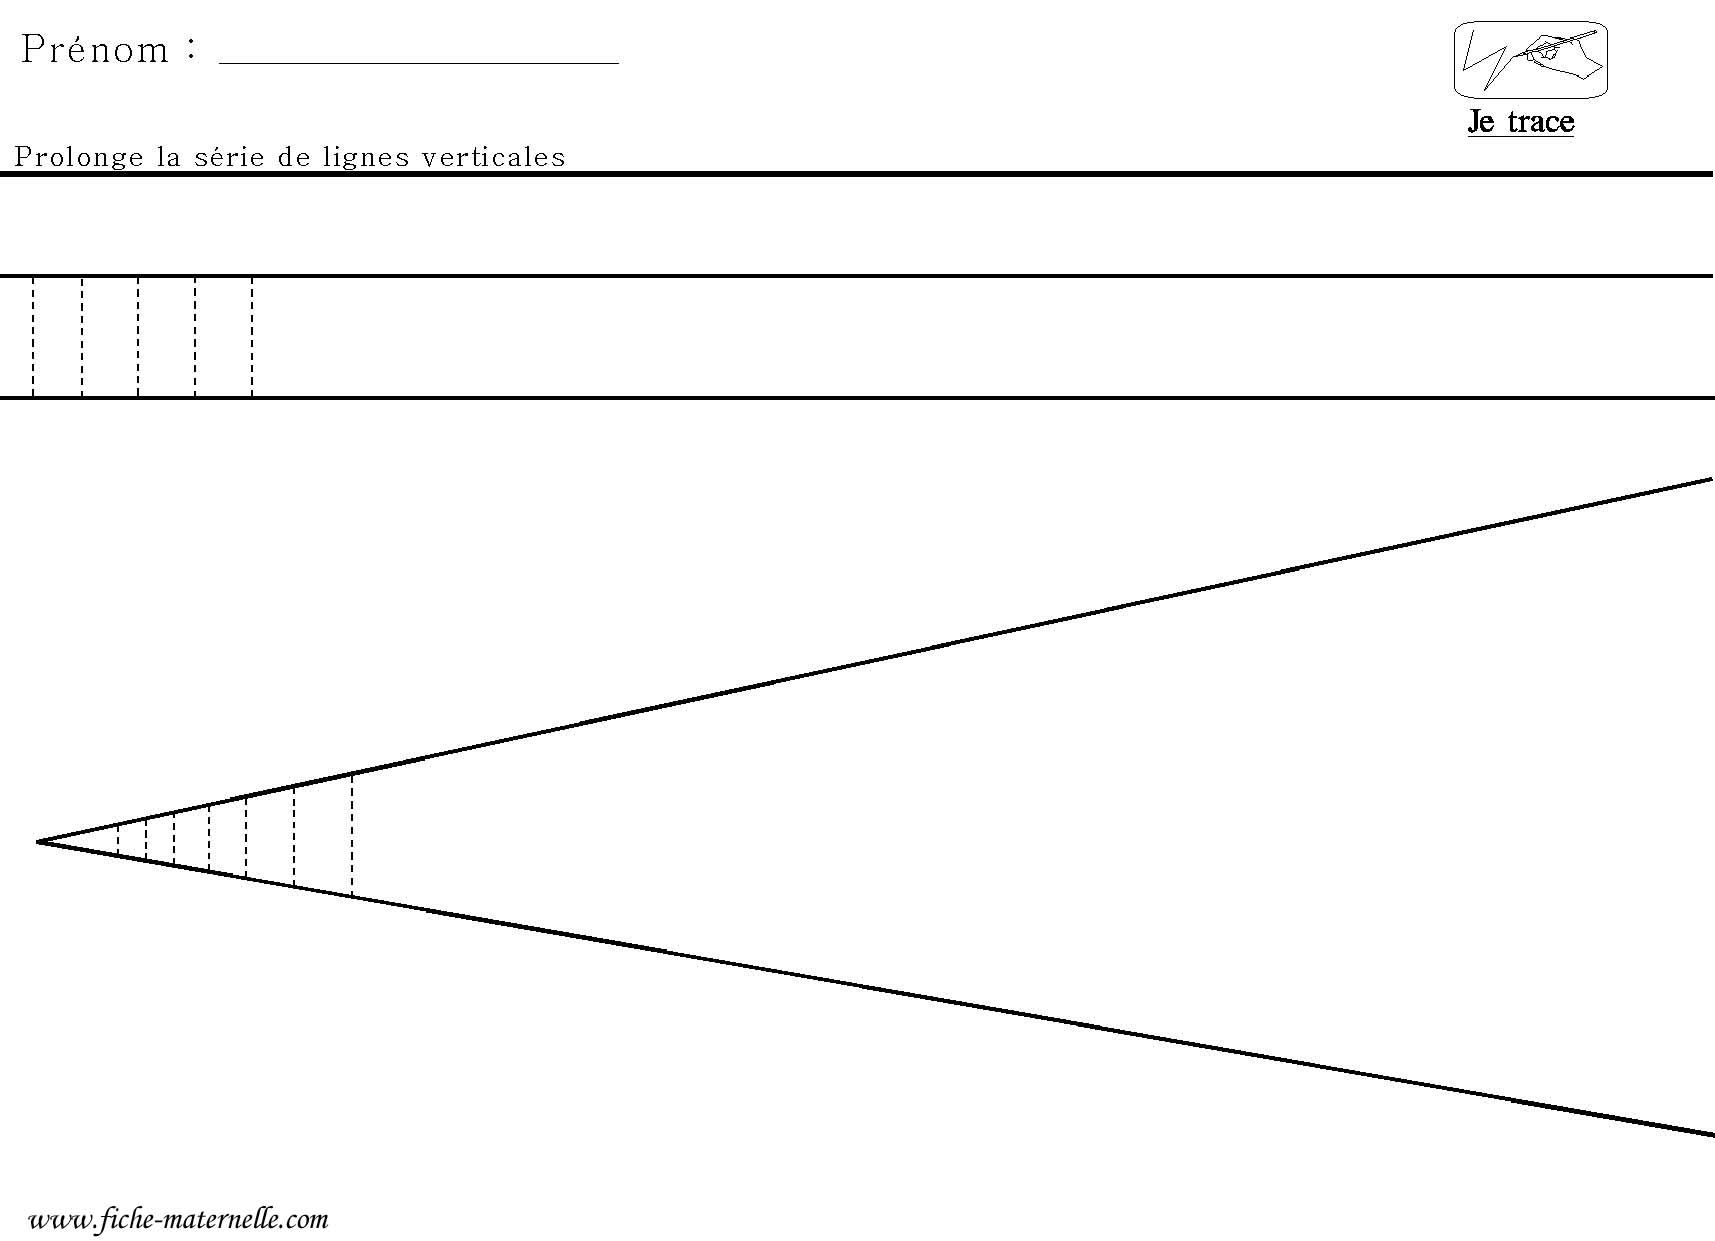 Graphisme Tracer Des Lignes Verticales Entre Deux Lignes